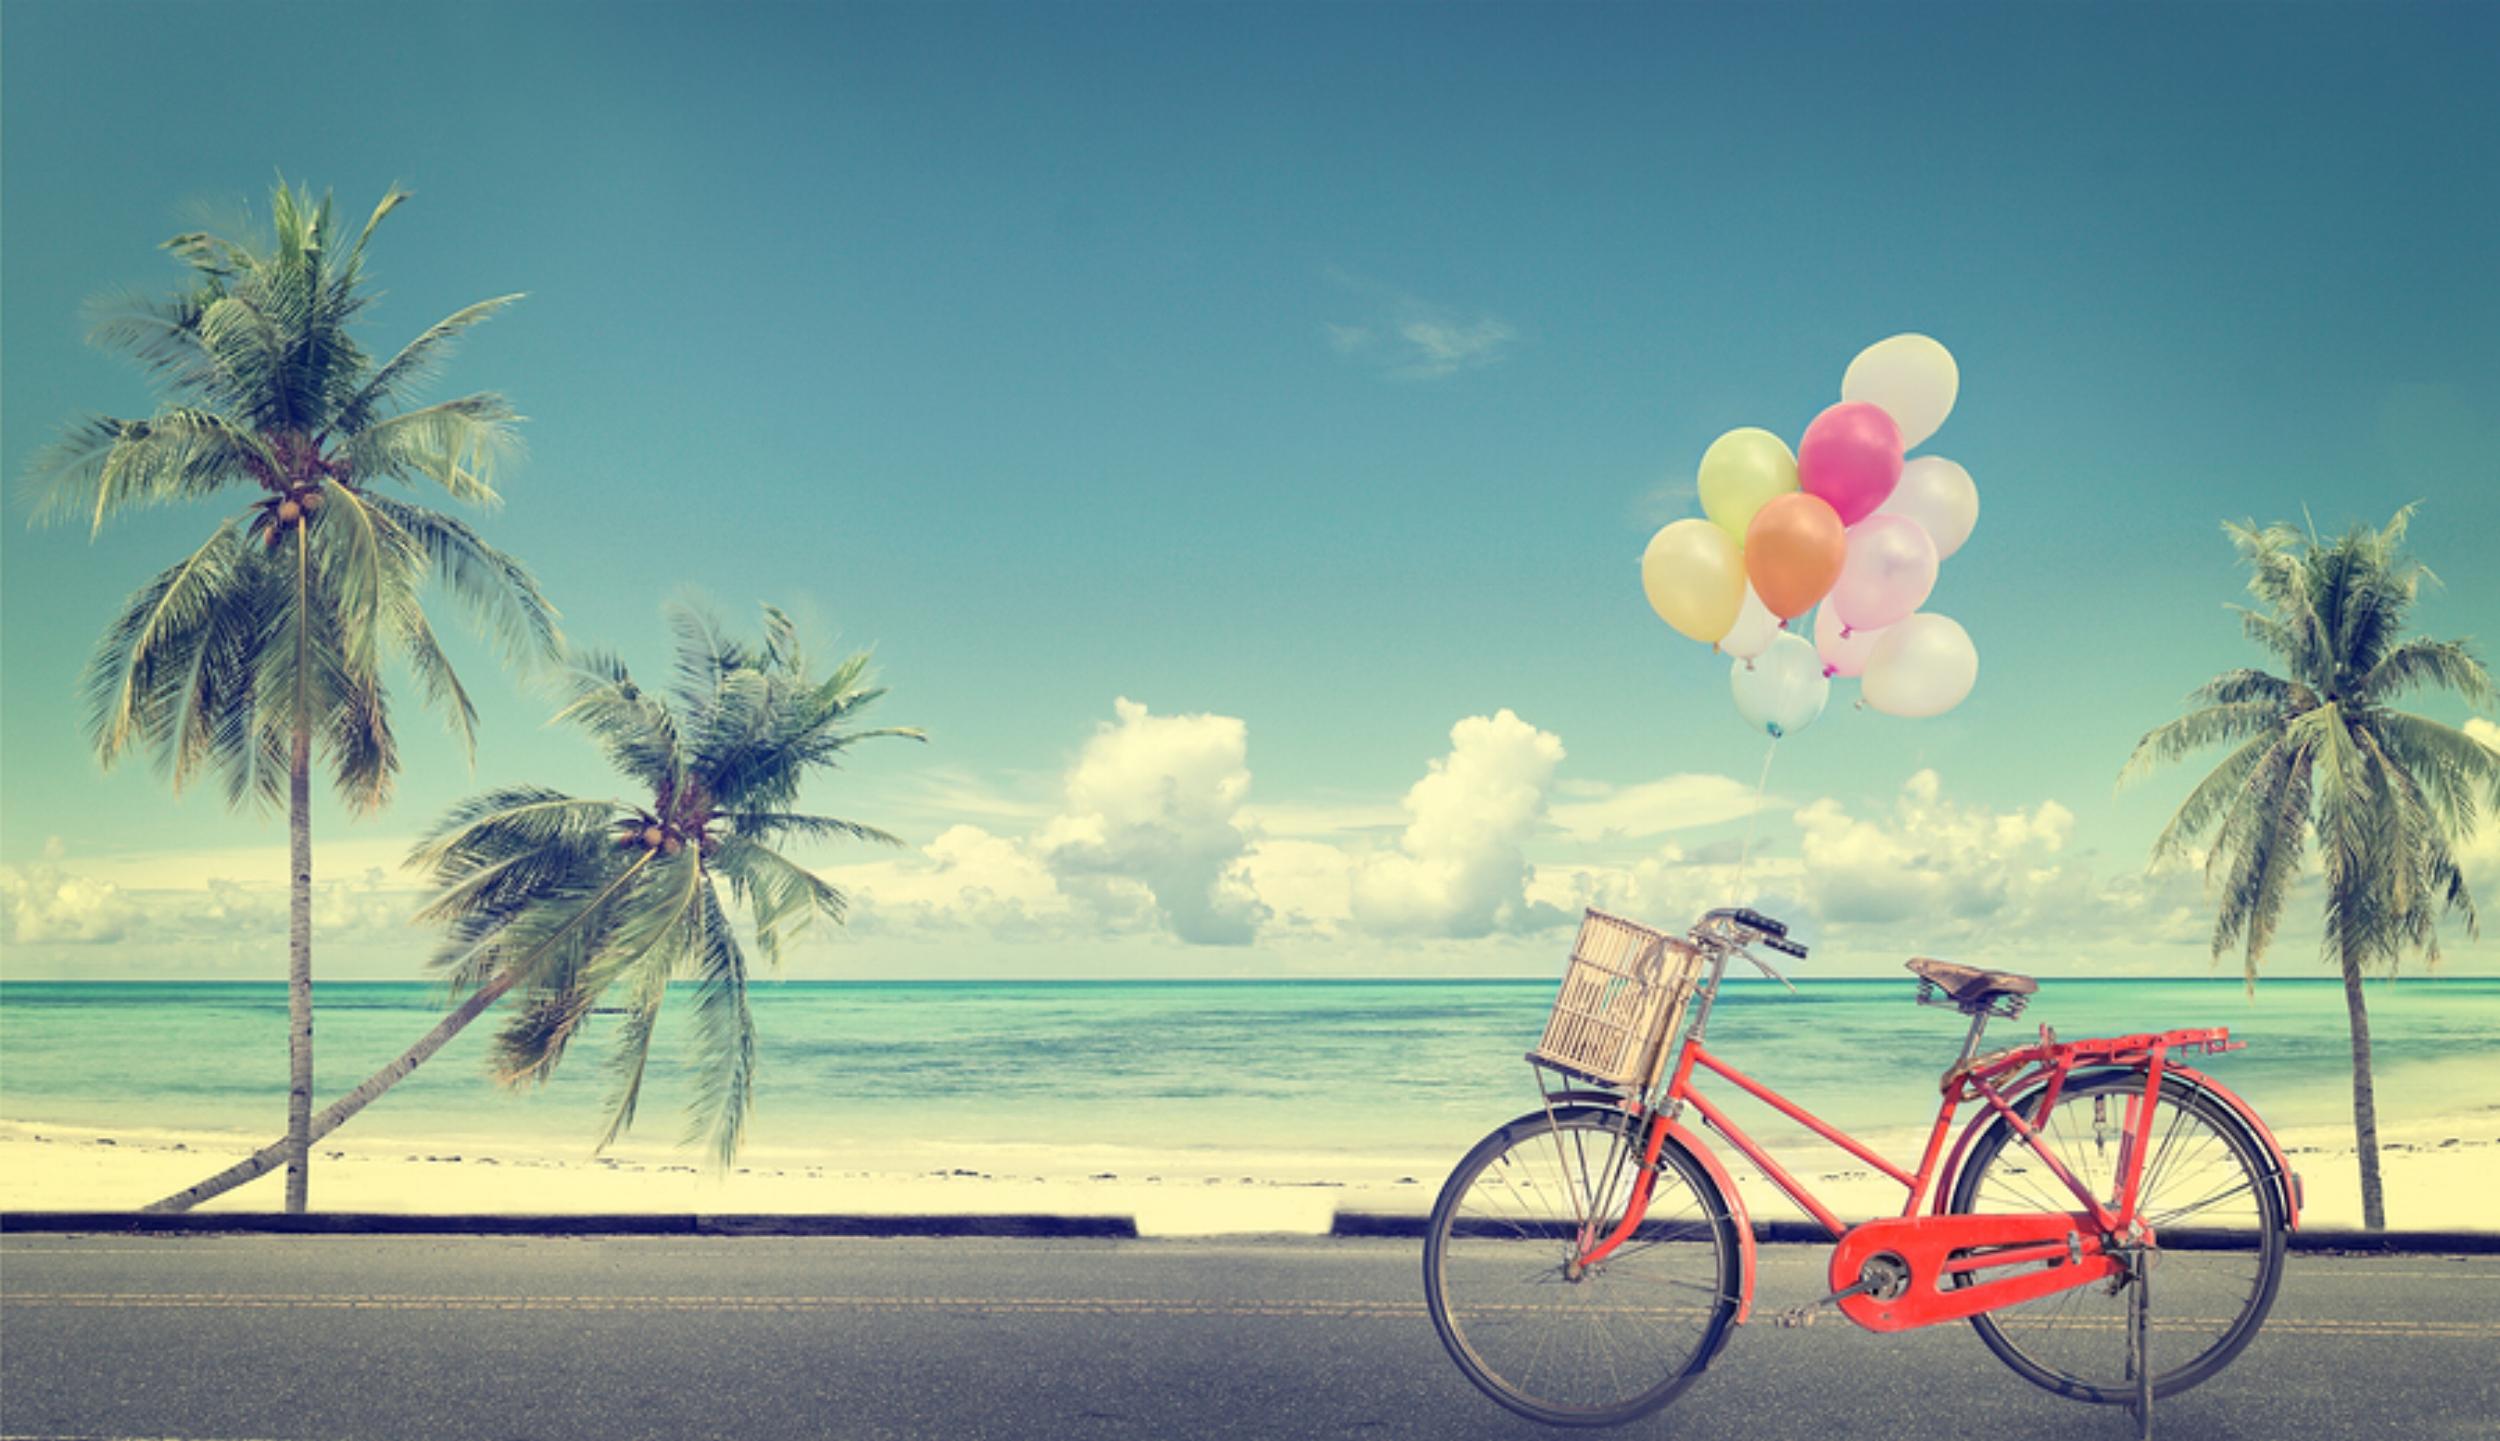 bigstock-vintage-bicycle-with-balloon-o-94208555.jpg